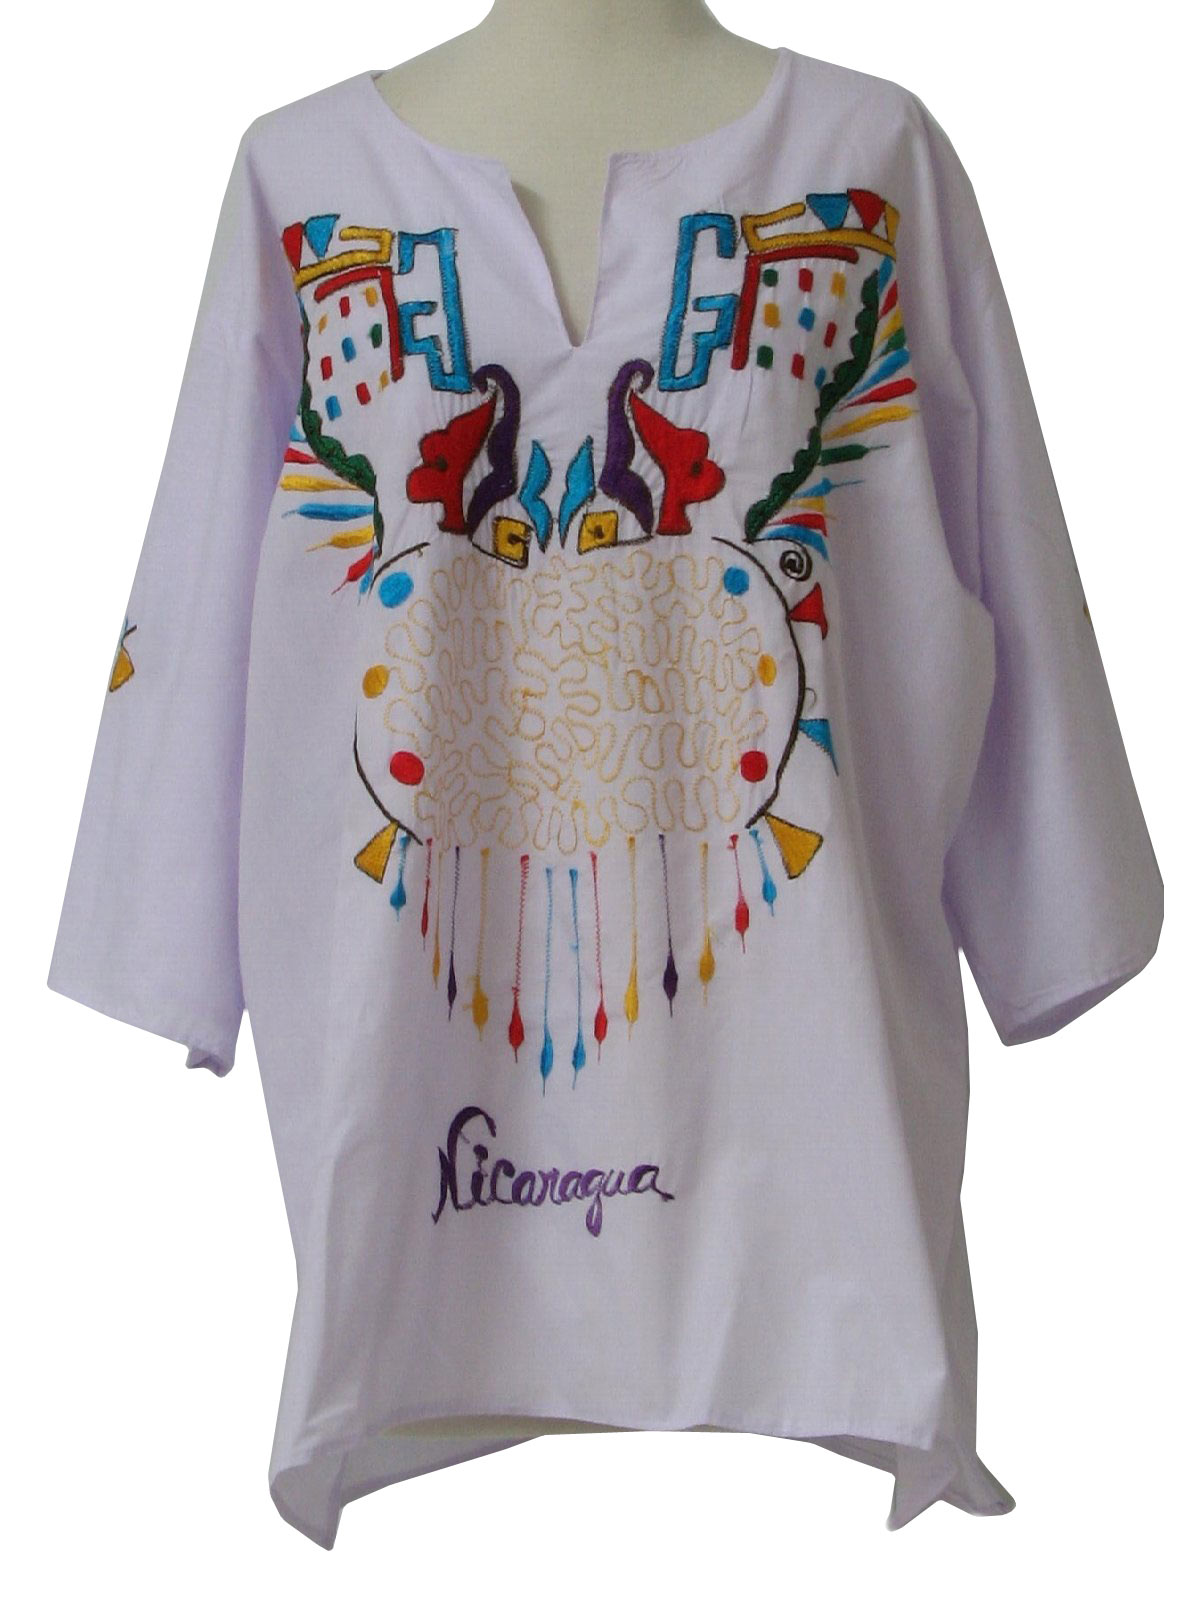 1980 S Retro Hippie Shirt 80s Made In Nicaragua Unisex